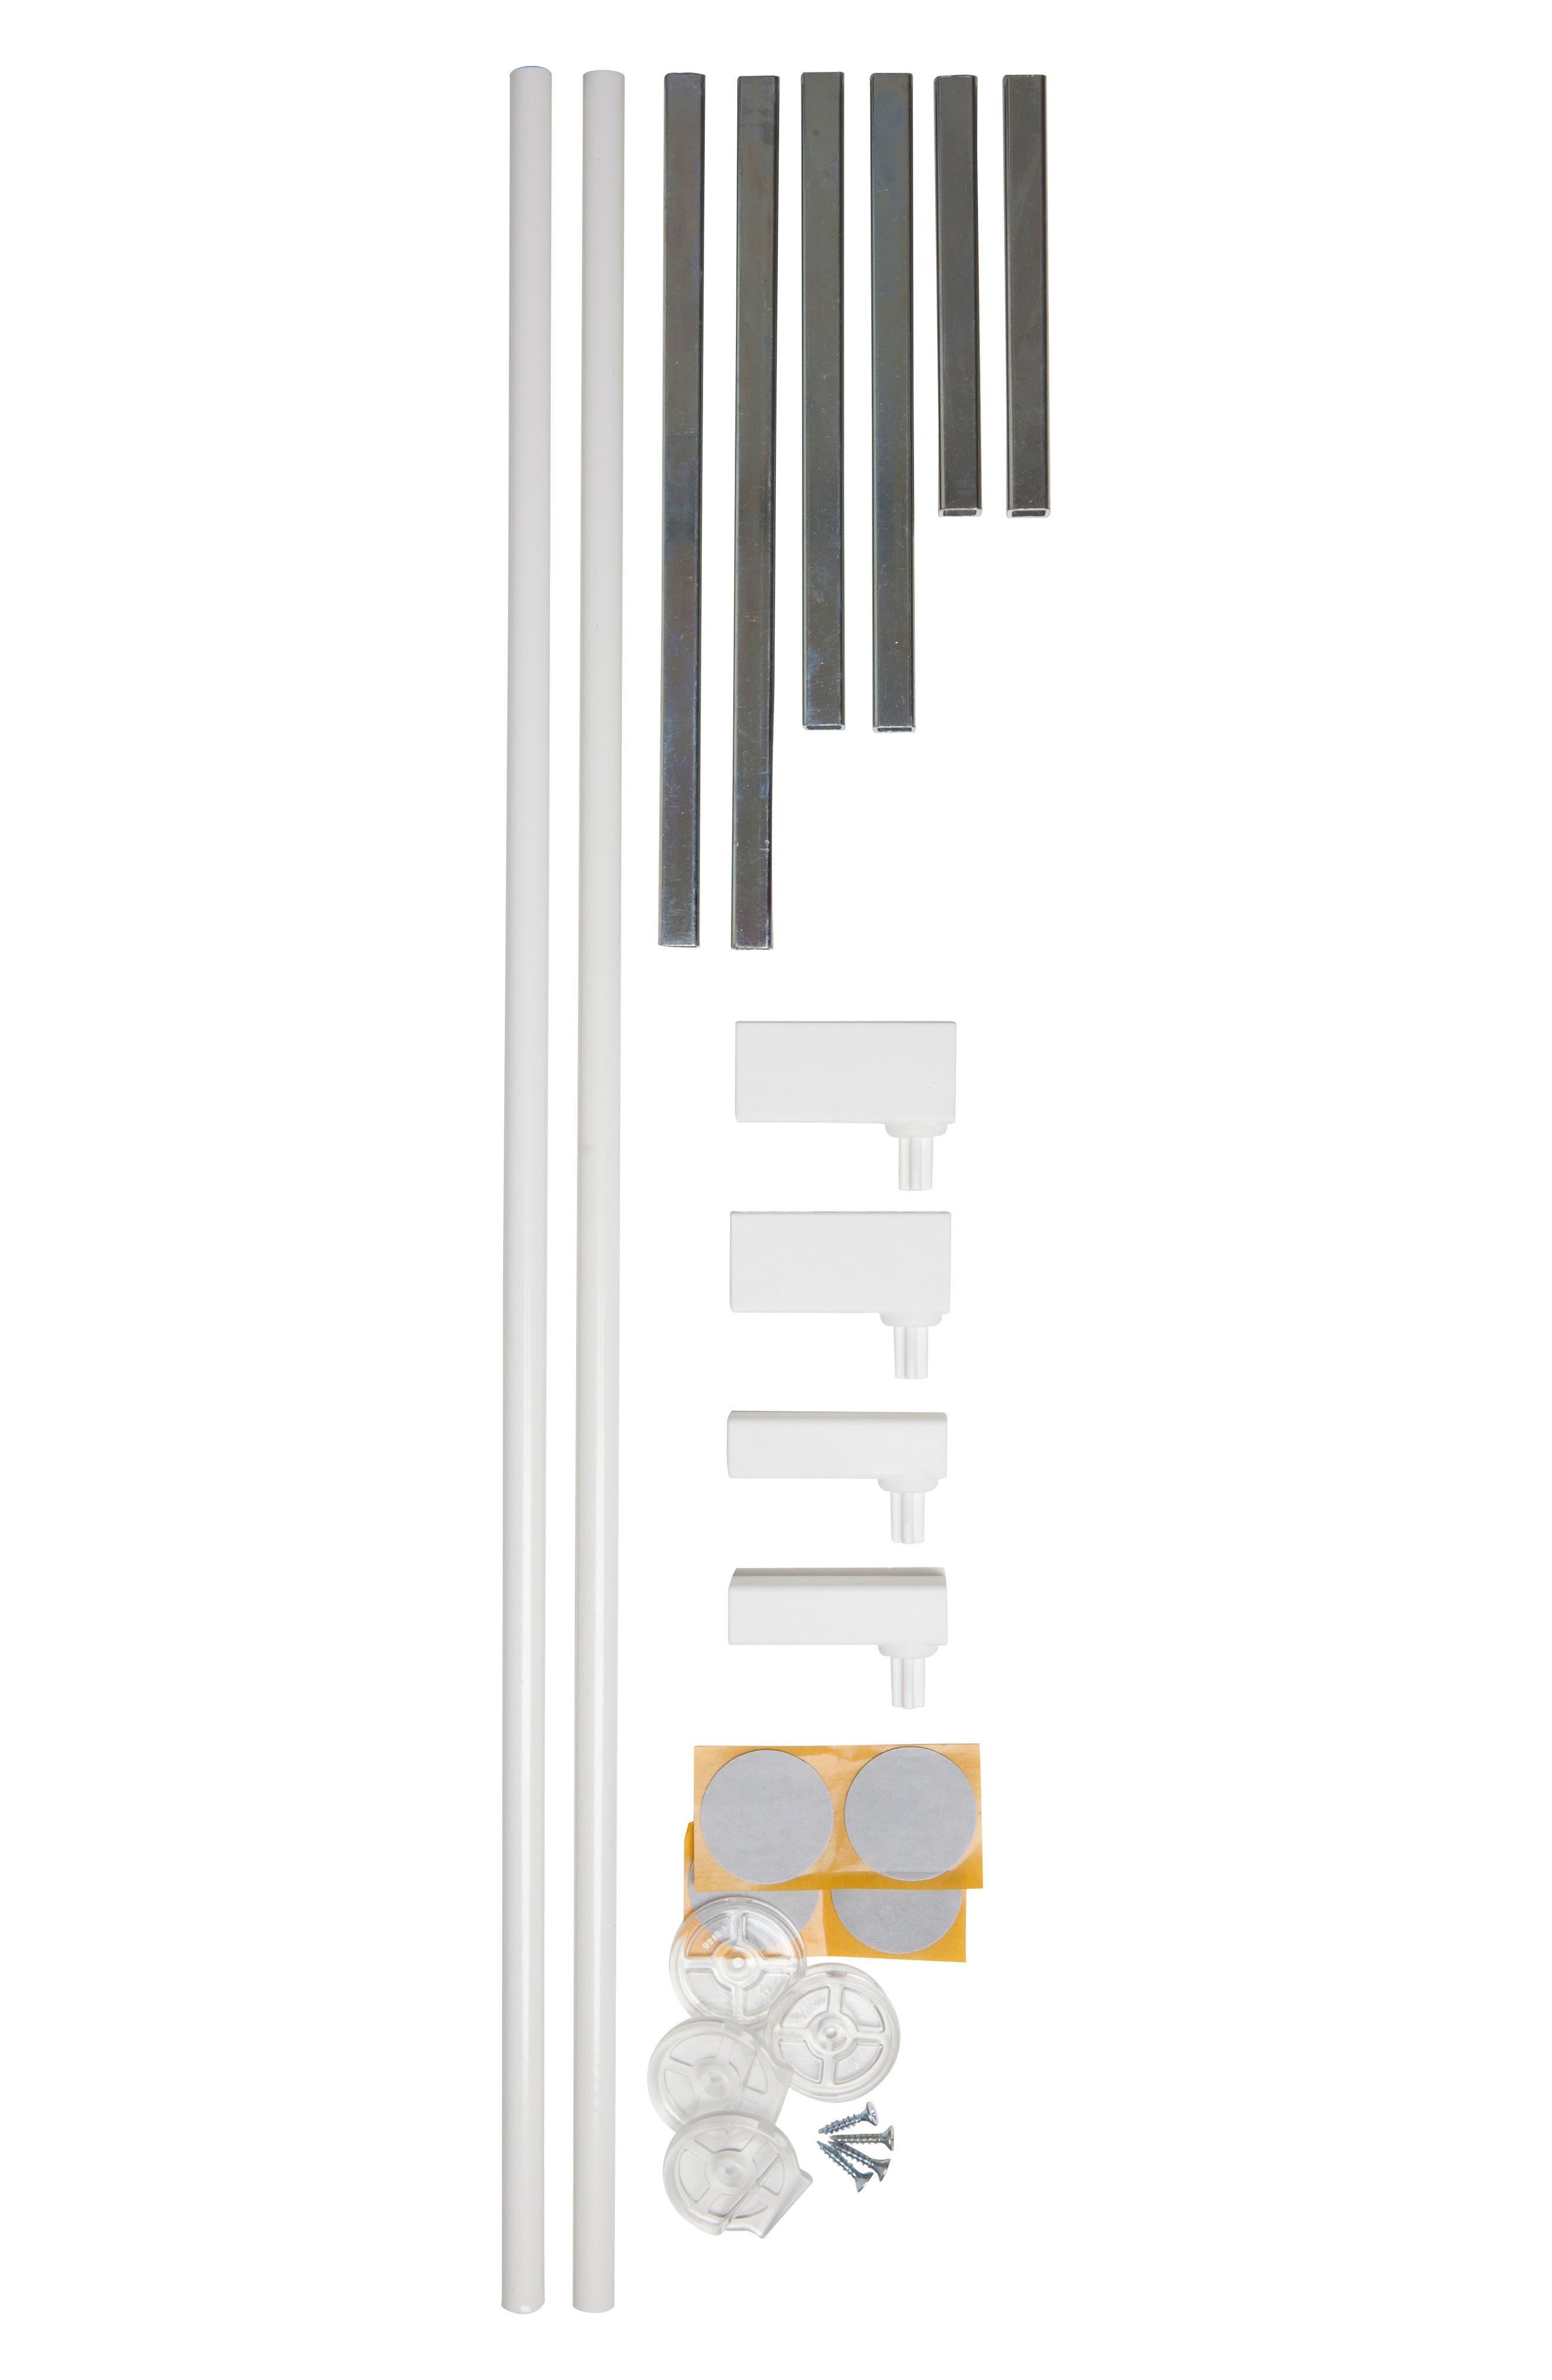 Premier Pressure Extend A Gate Kit,                         Main,                         color, White